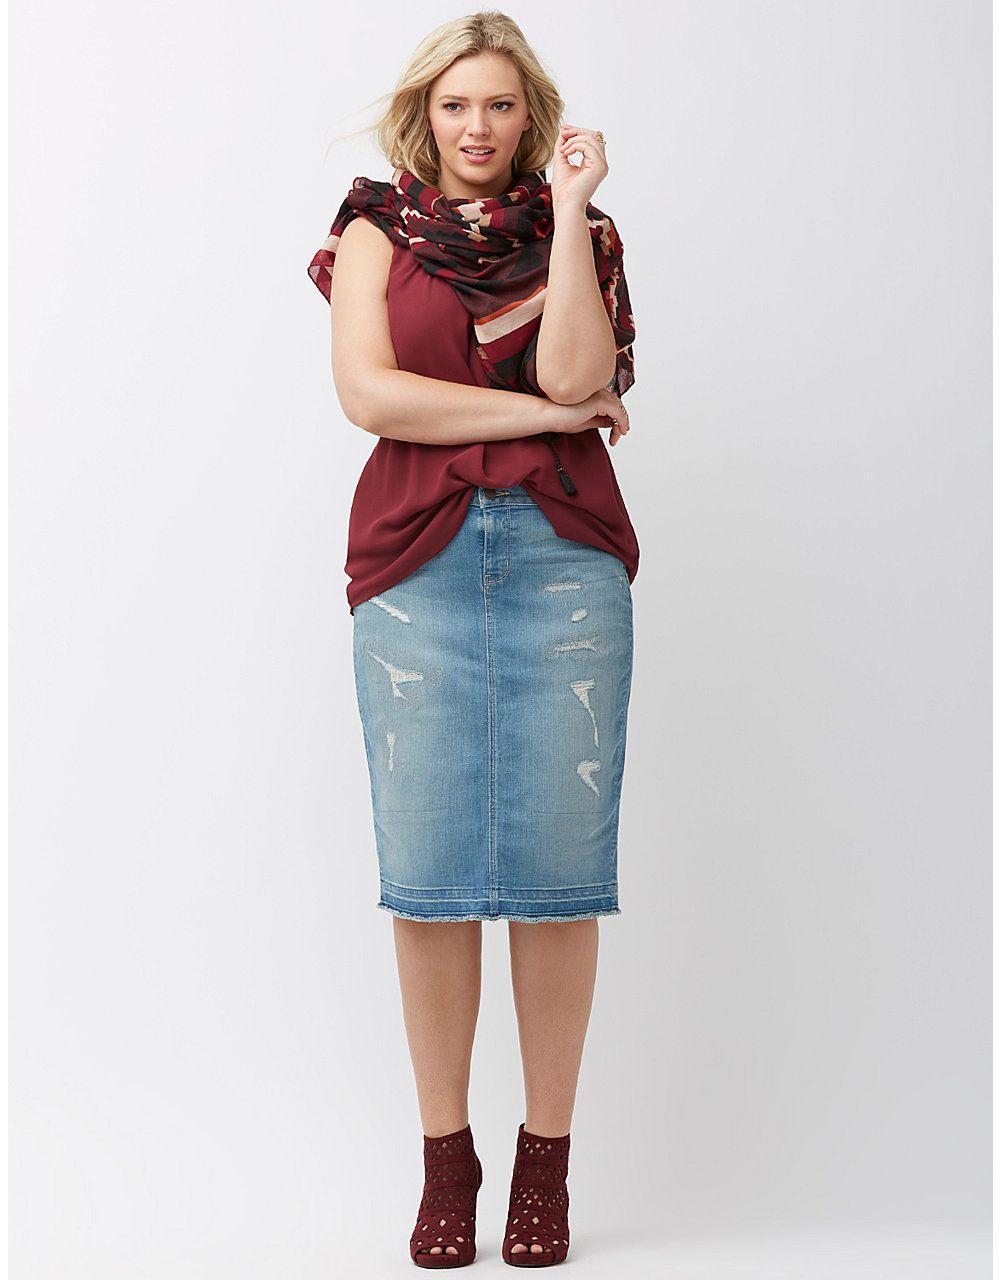 e9eb160d3b9 Plus Size Skirts. Destructed denim skirt by Lane Bryant